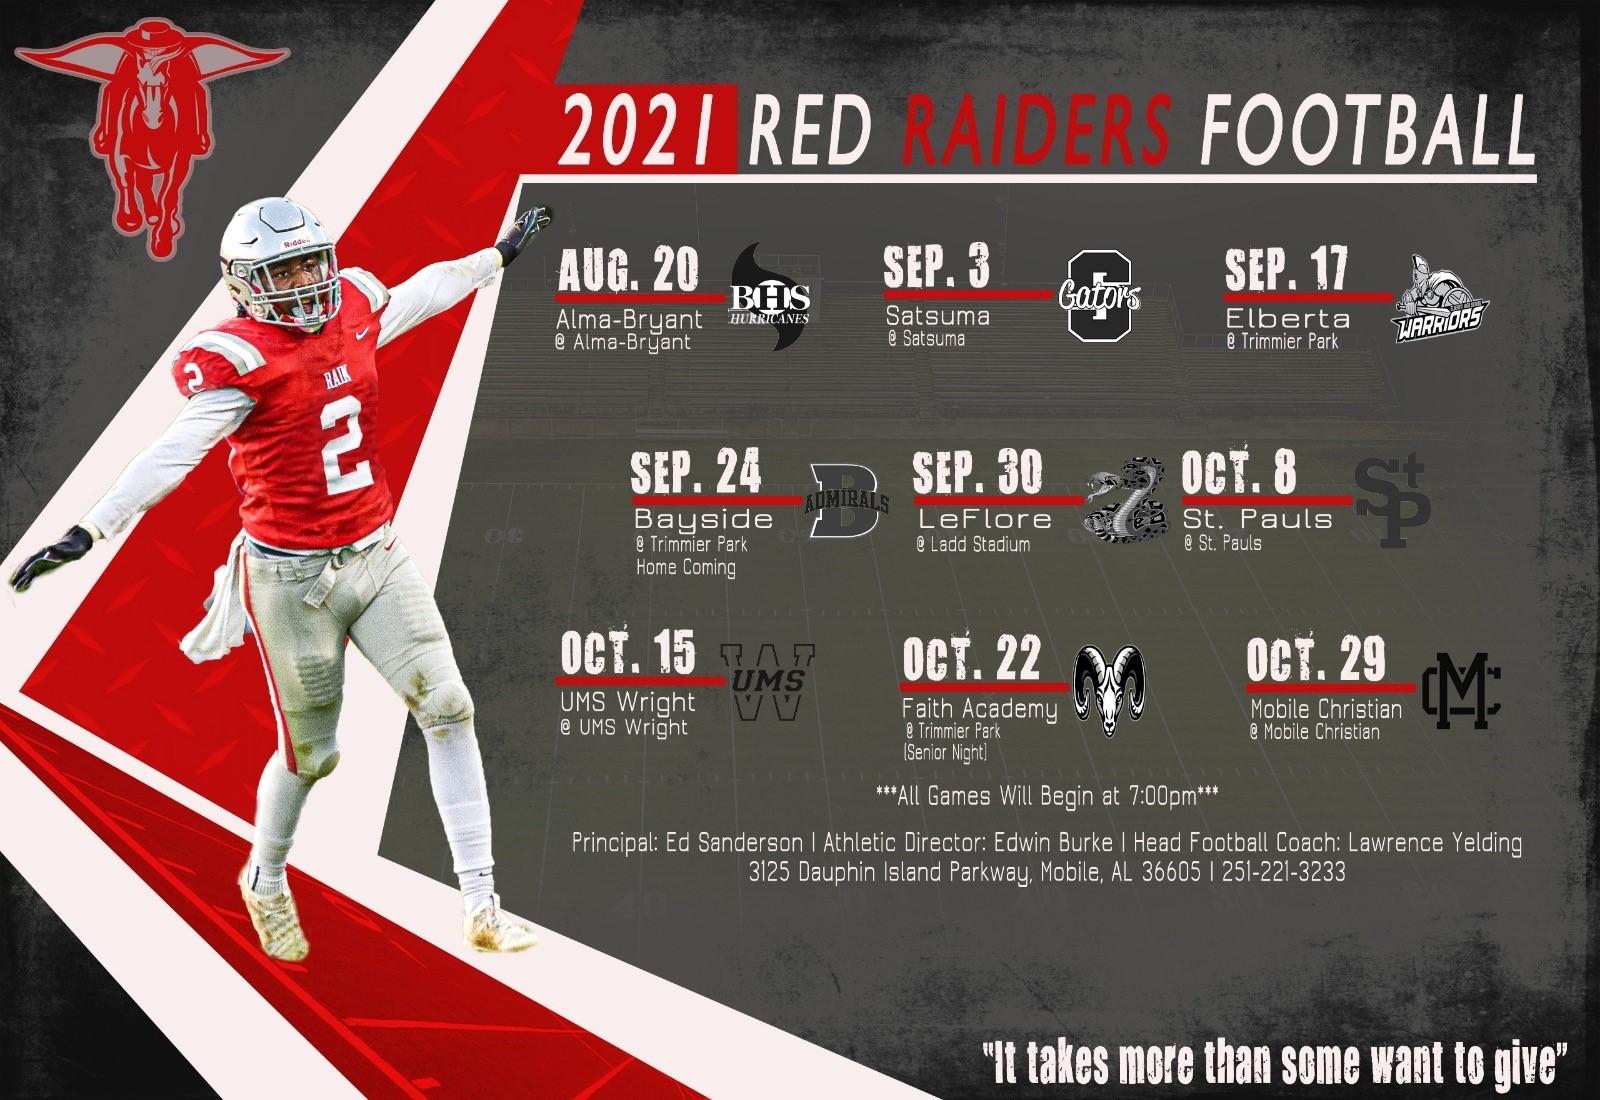 football schedule 2021